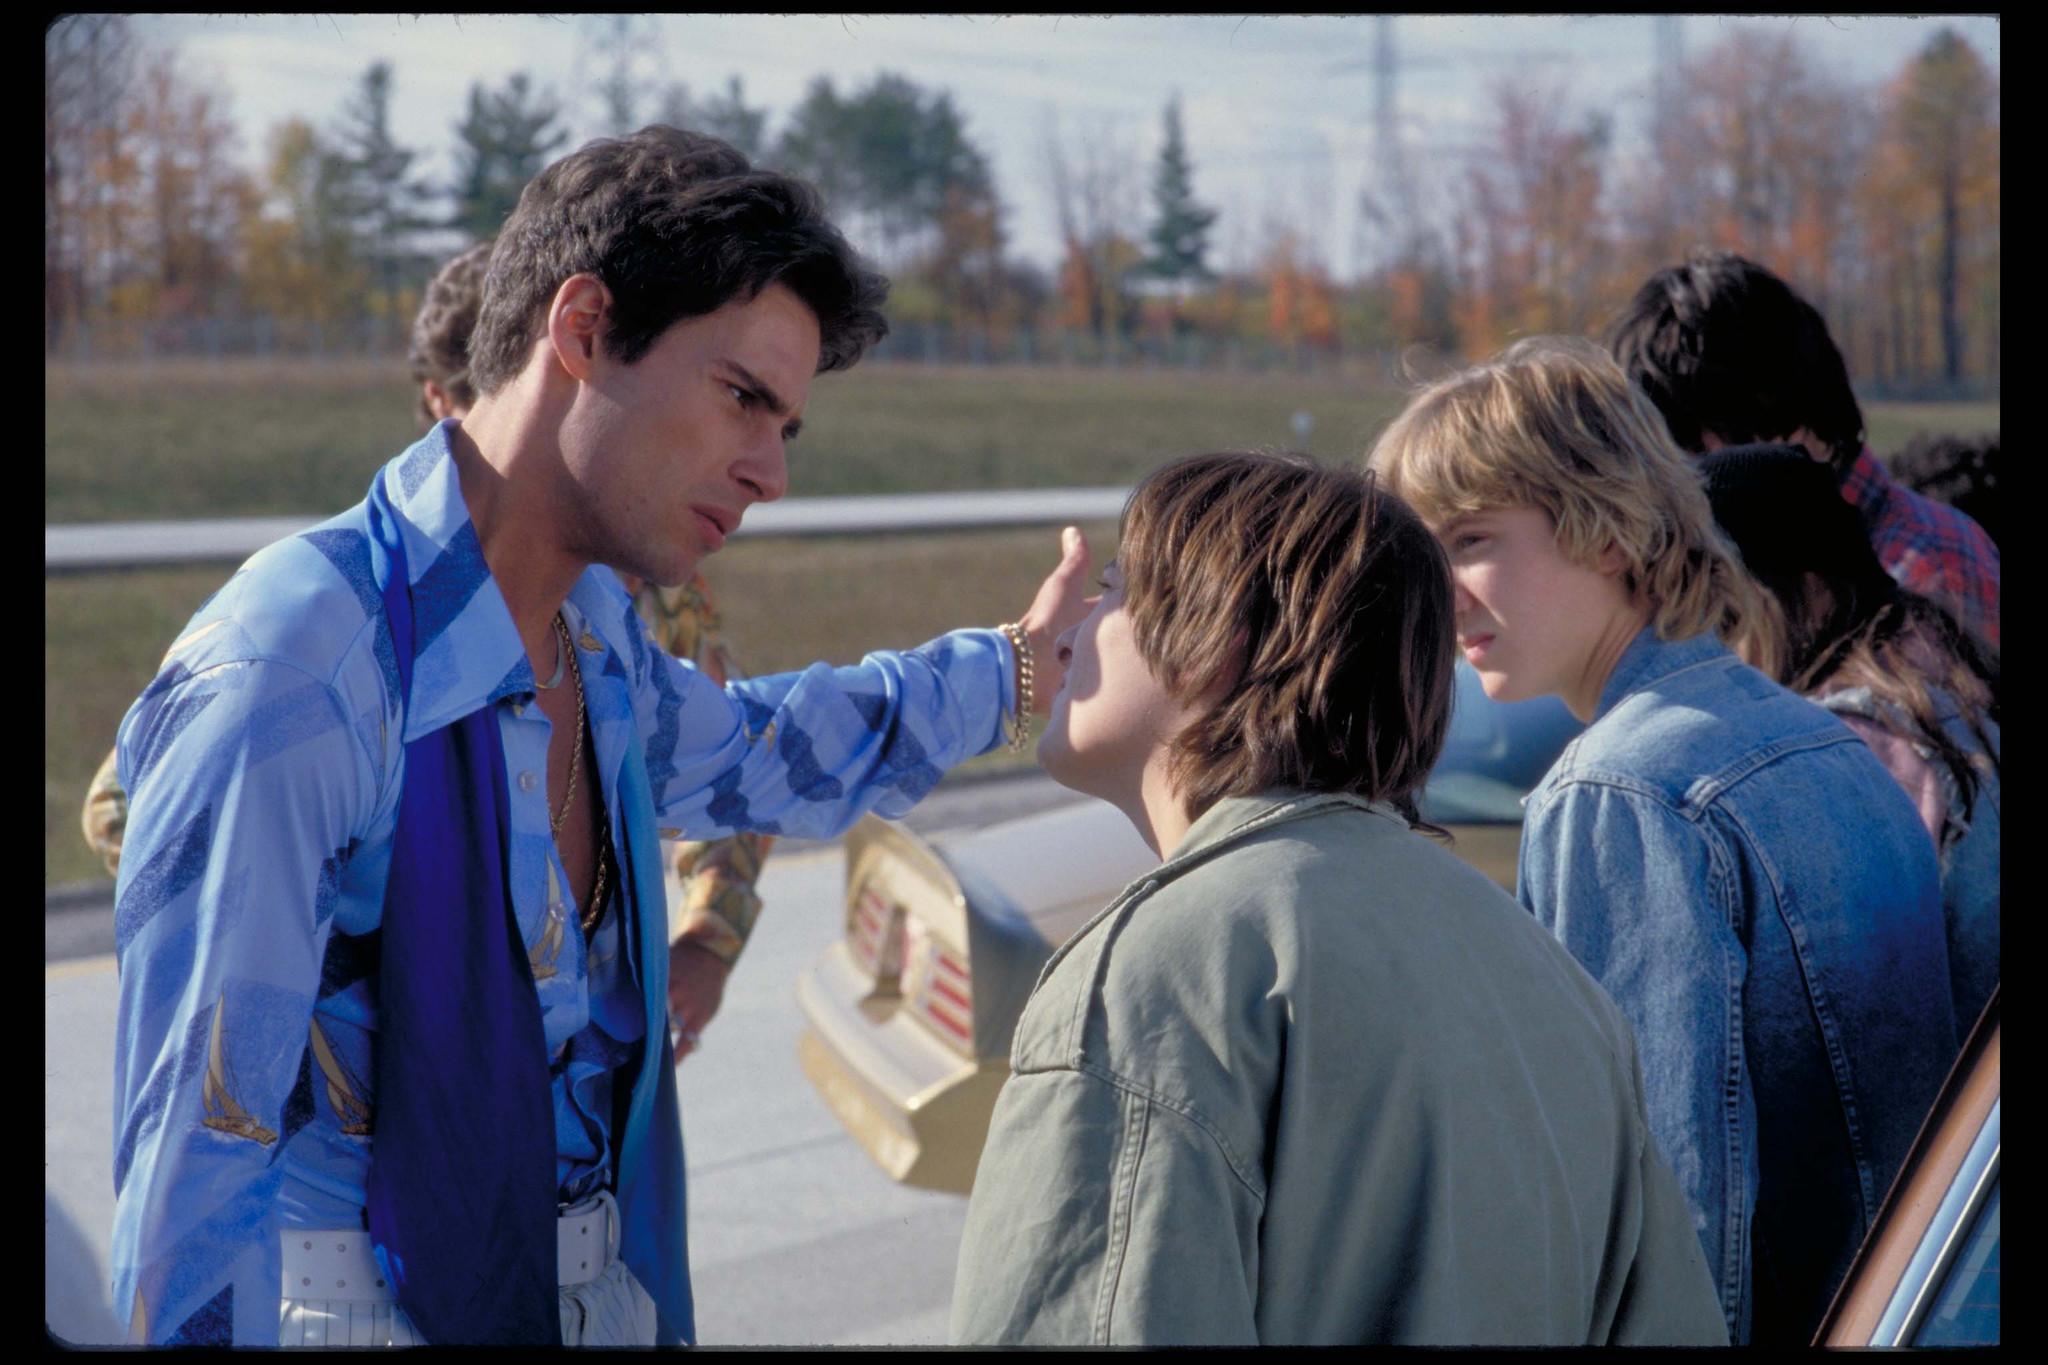 Edward Furlong, Sam Huntington, and Nick Scotti in Detroit Rock City (1999)